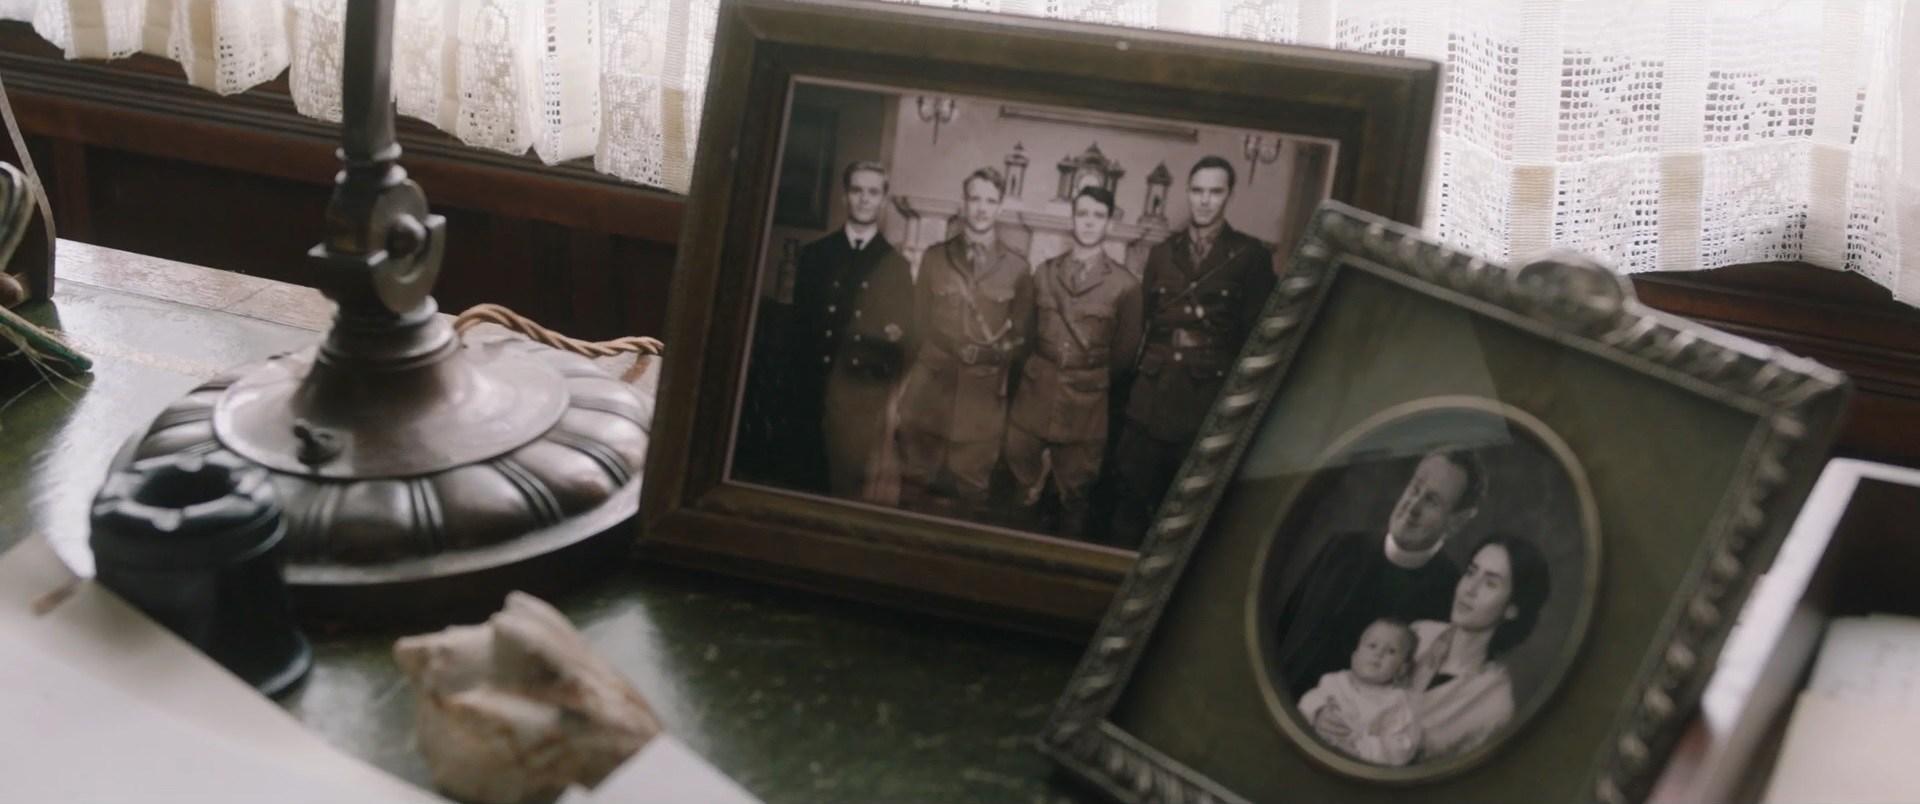 Tolkien-fotos_familia